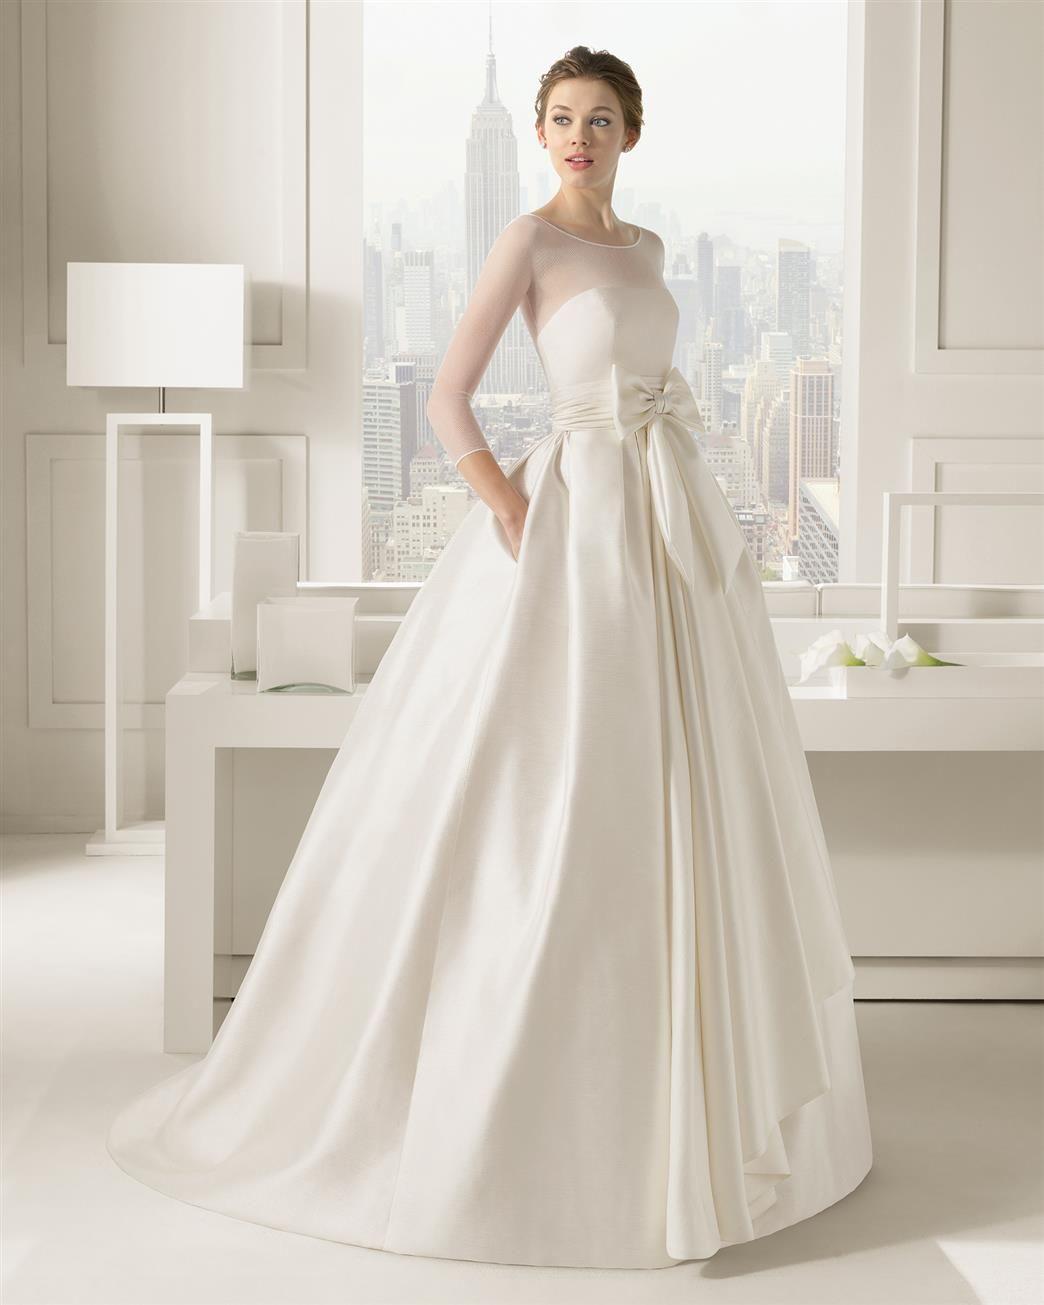 long dresses for weddings 30 Exquisite Elegant Long Sleeved Wedding Dresses